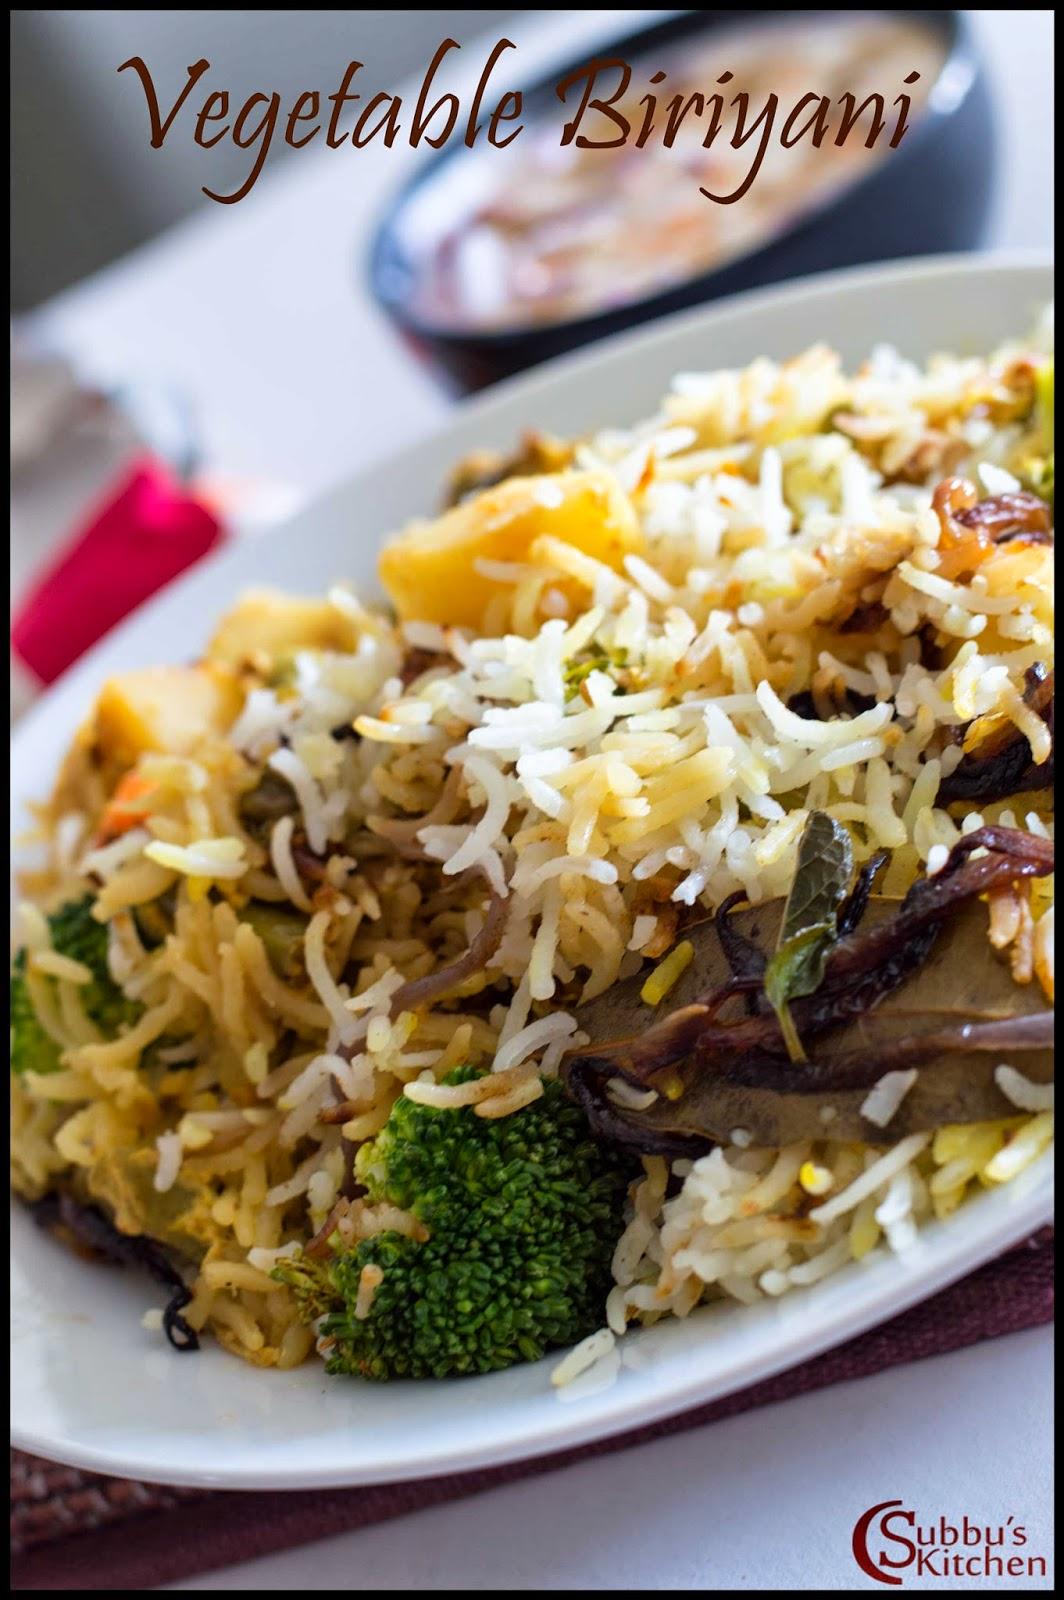 Vegetable Biriyani Recipe | How to make Vegetable Biriyani